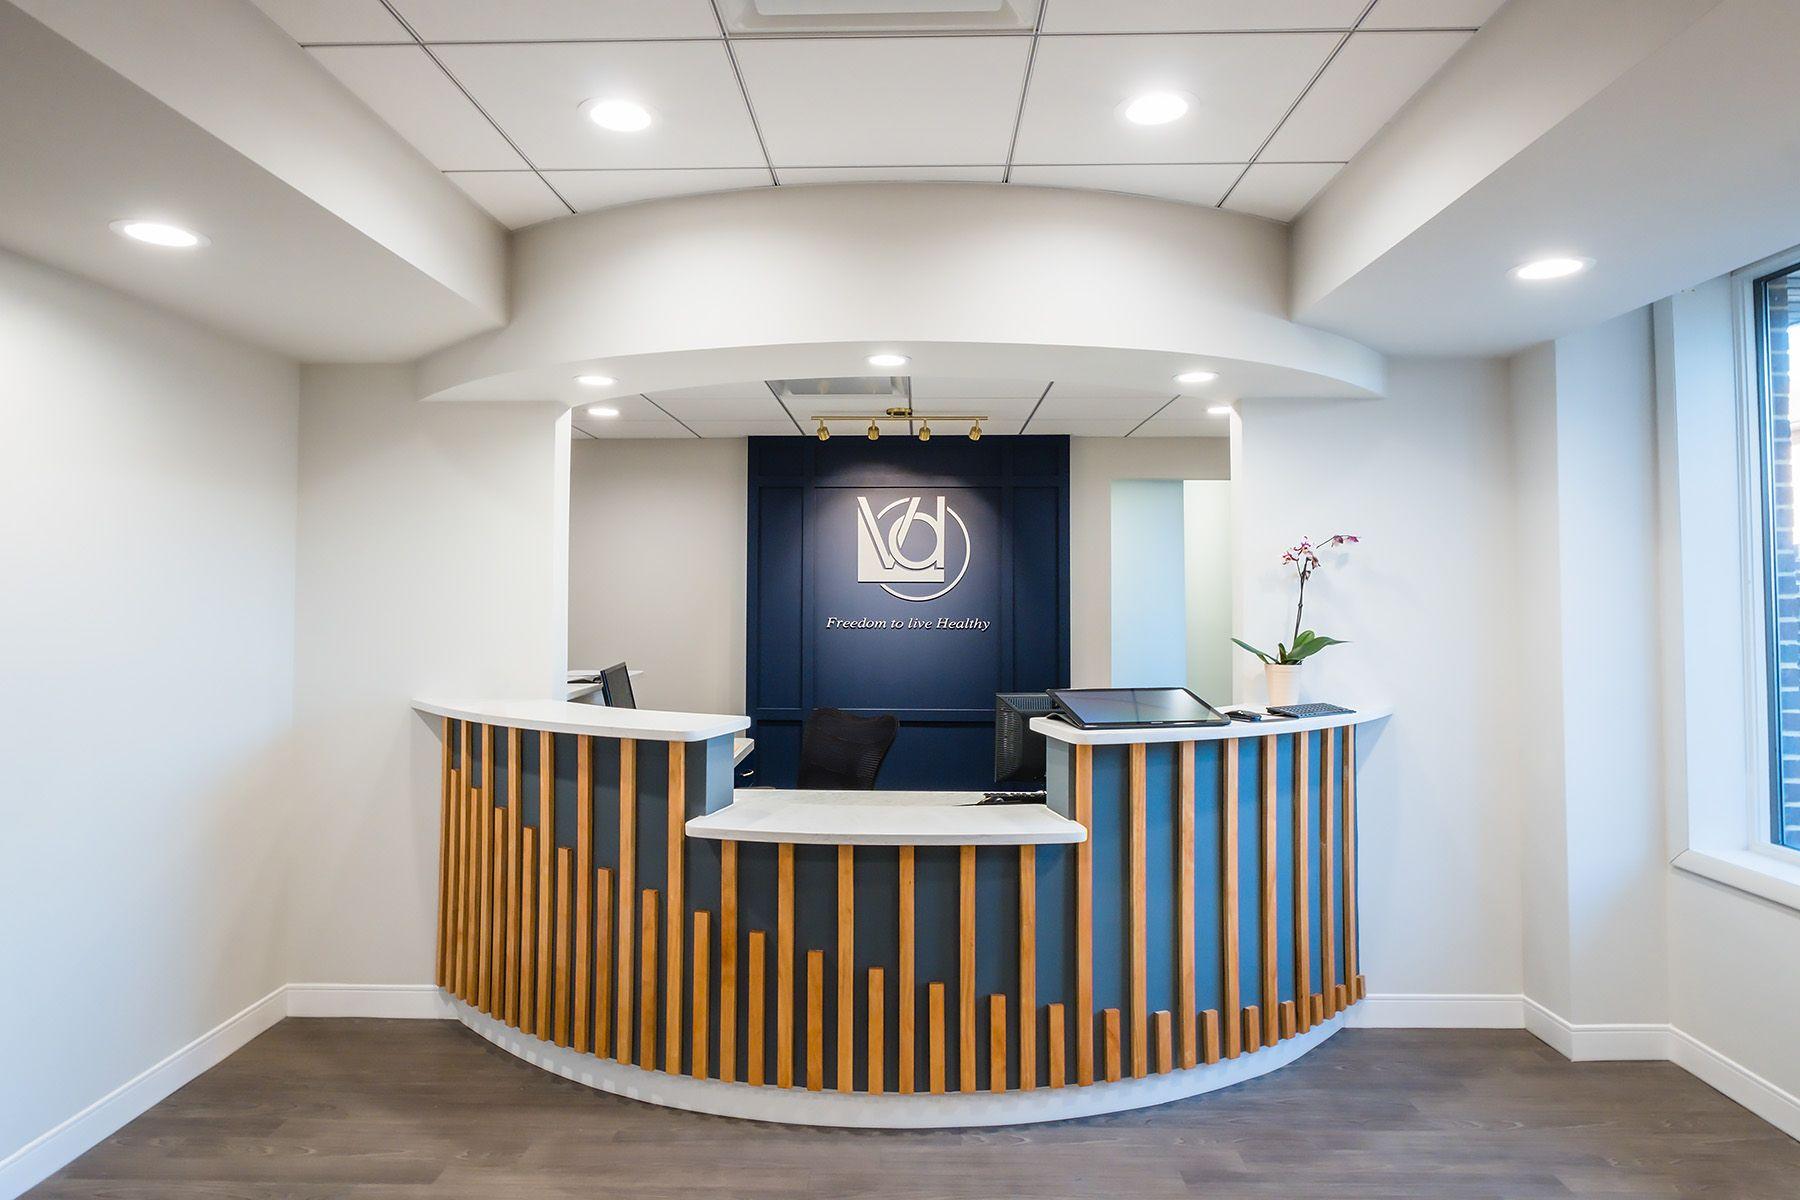 doppalapudi periodontics dental implant surgery reception desk rh pinterest com